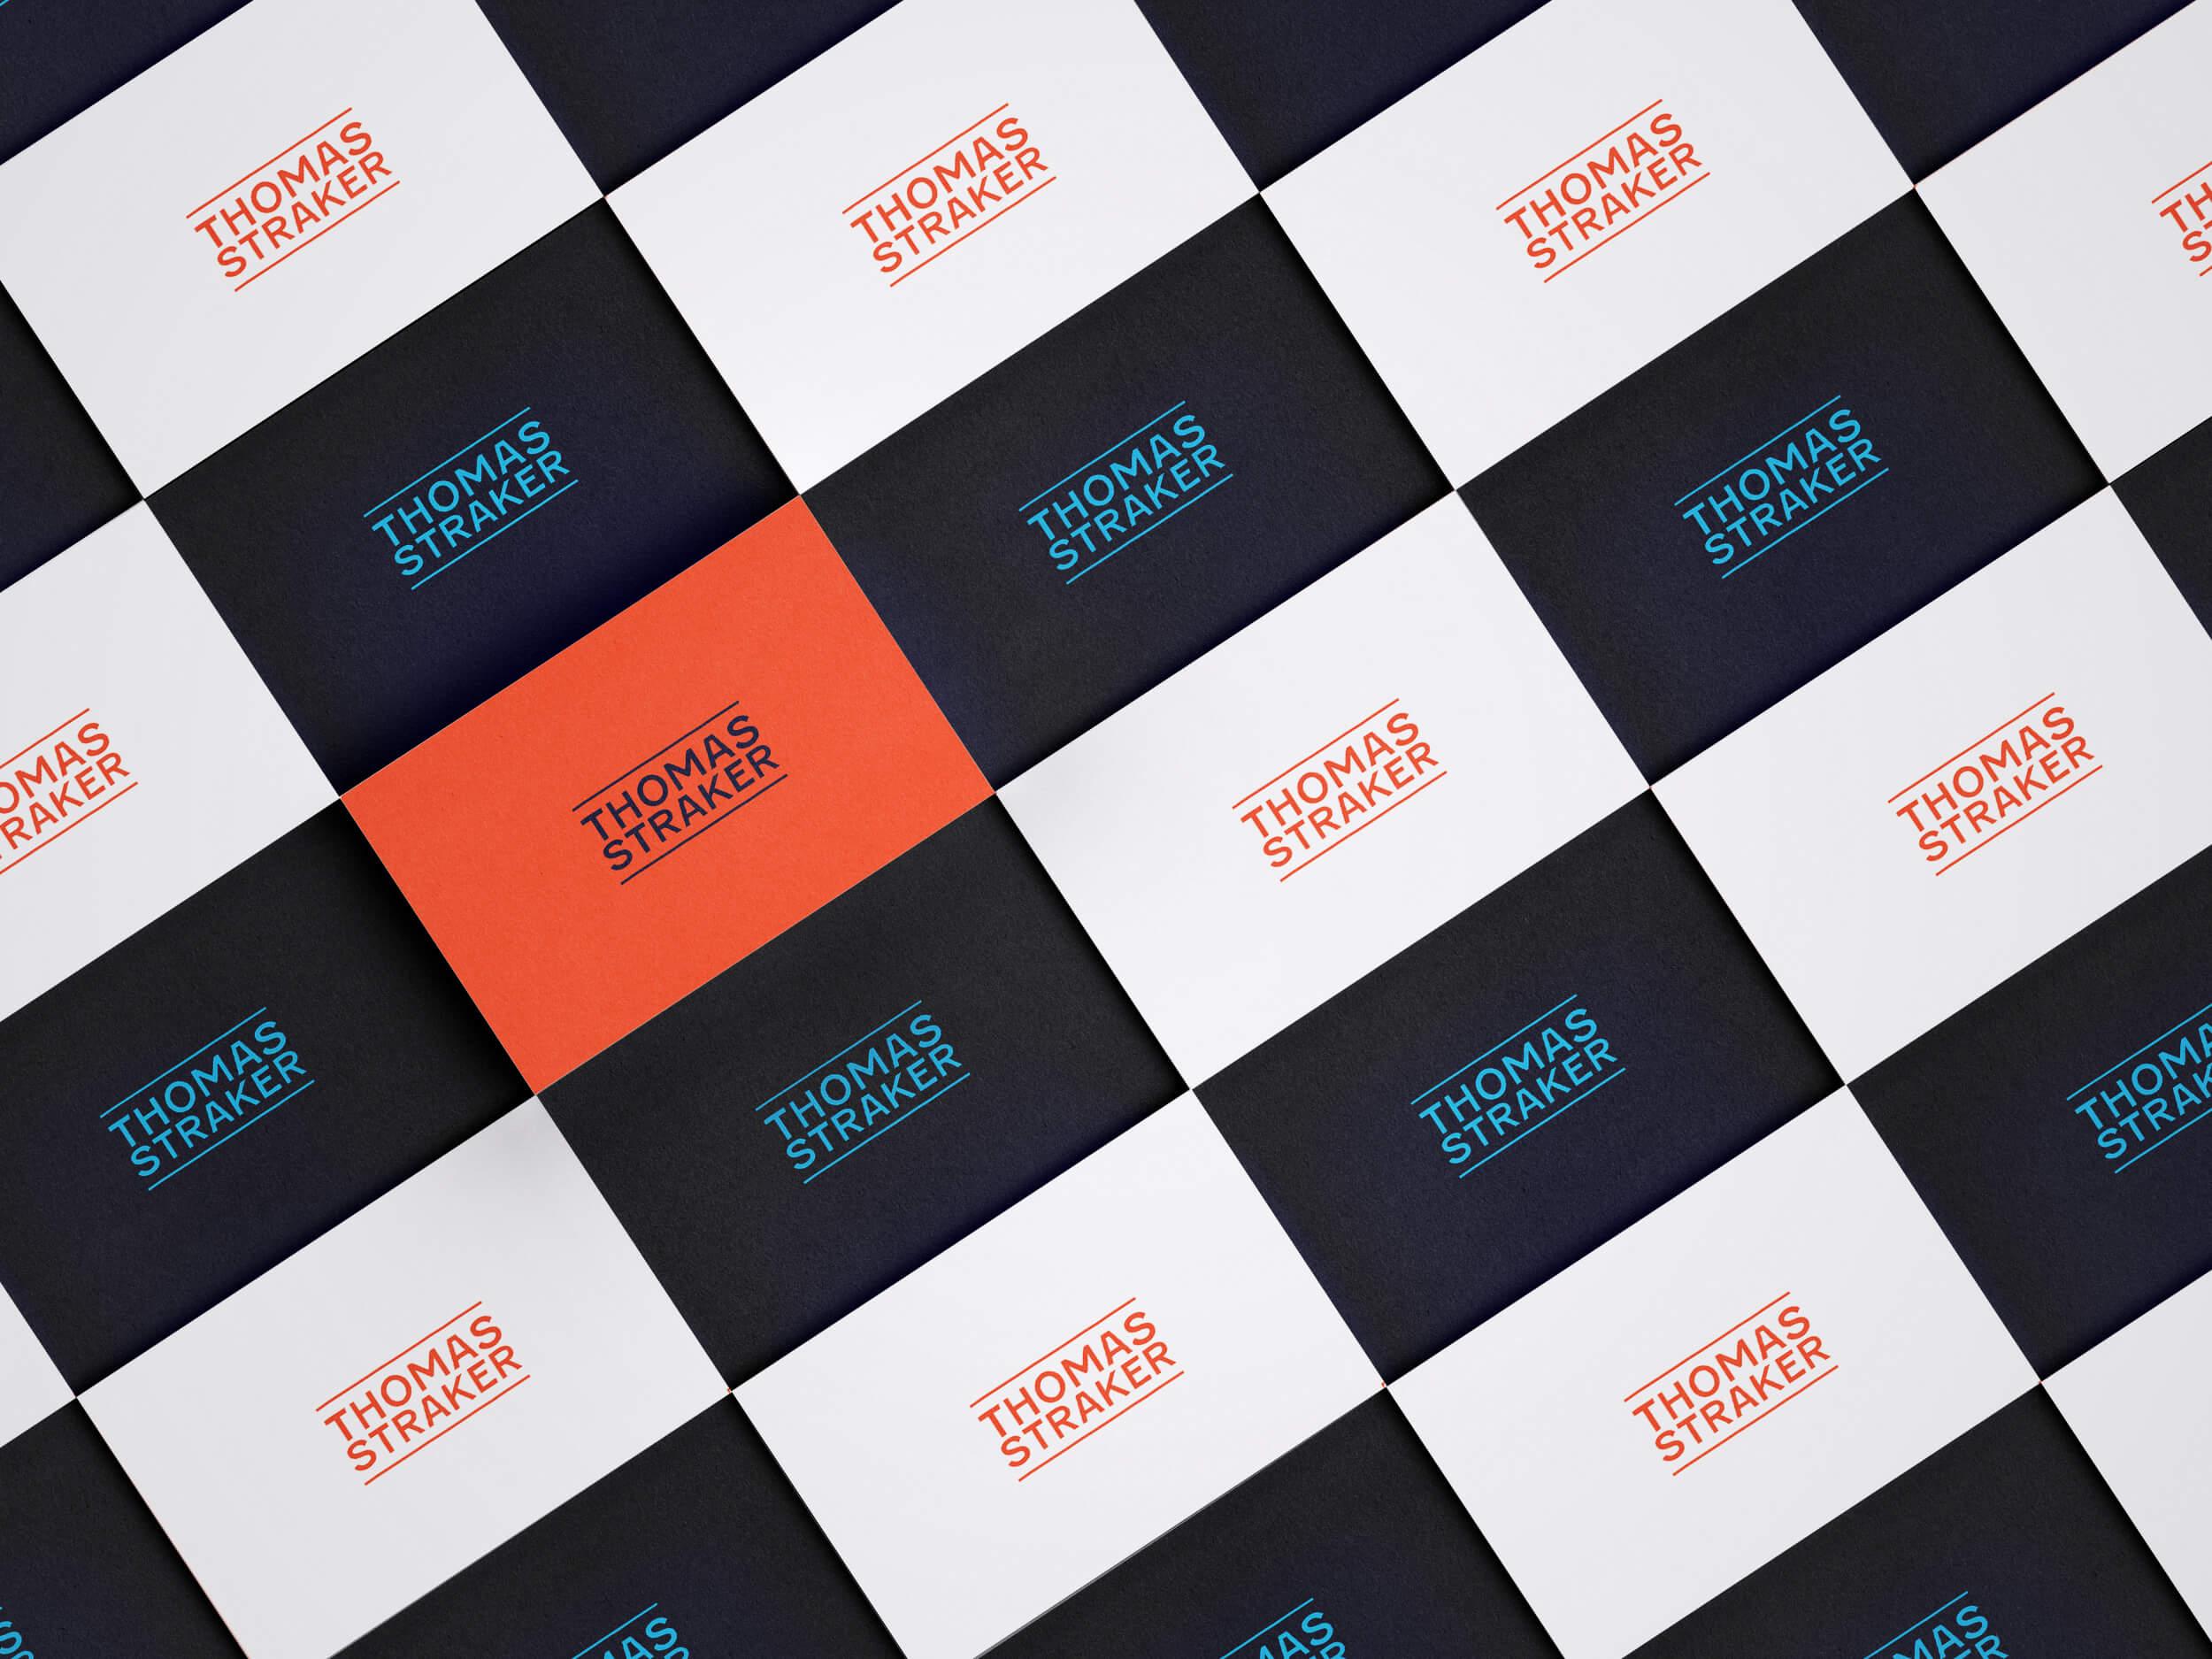 dooka_thomas-straker_business-card-image